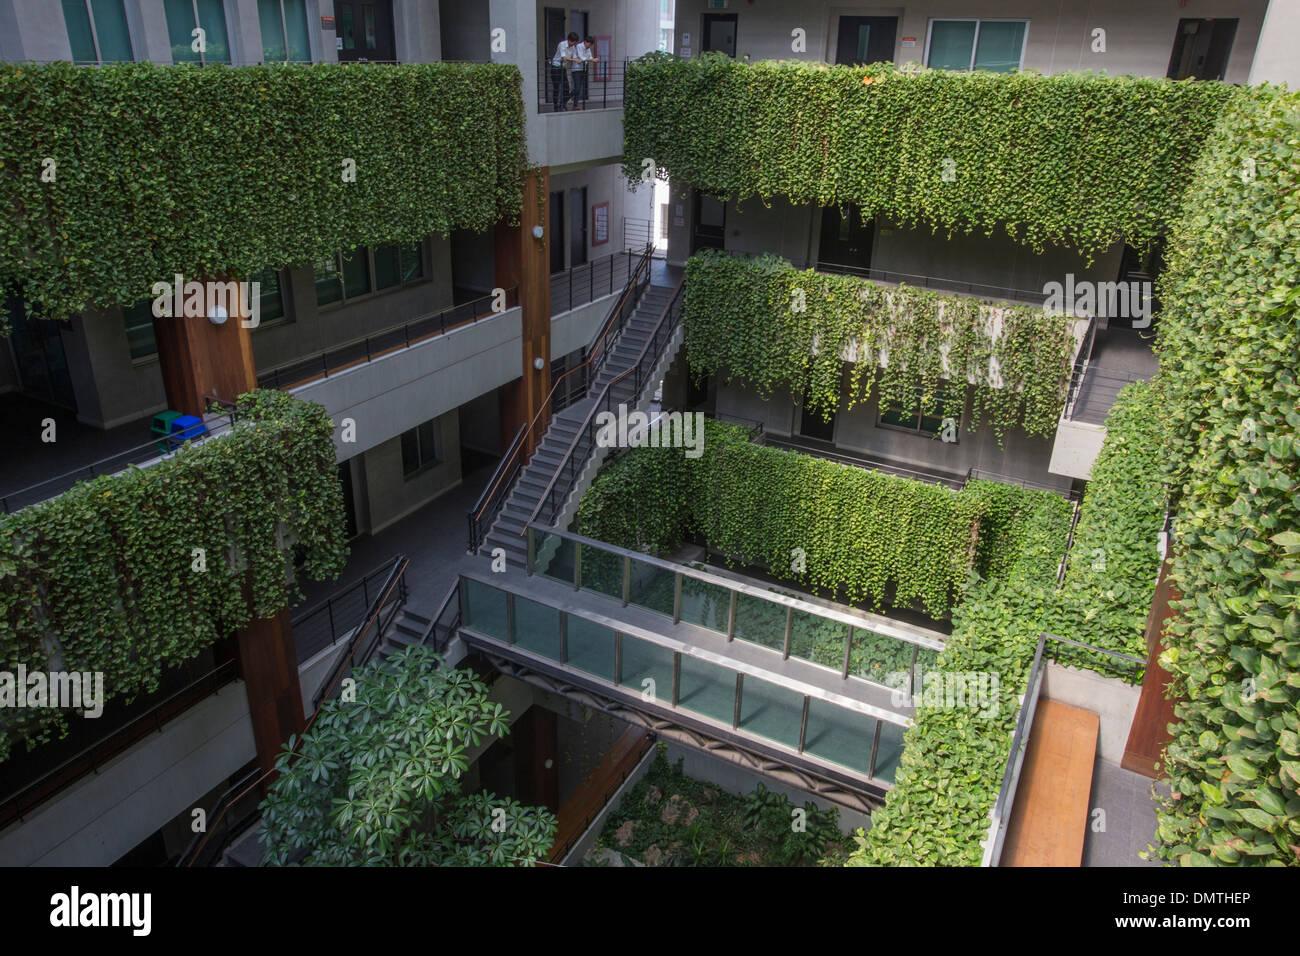 Vertical garden green wall at Kasetsart University Faculty of Economics. - Stock Image